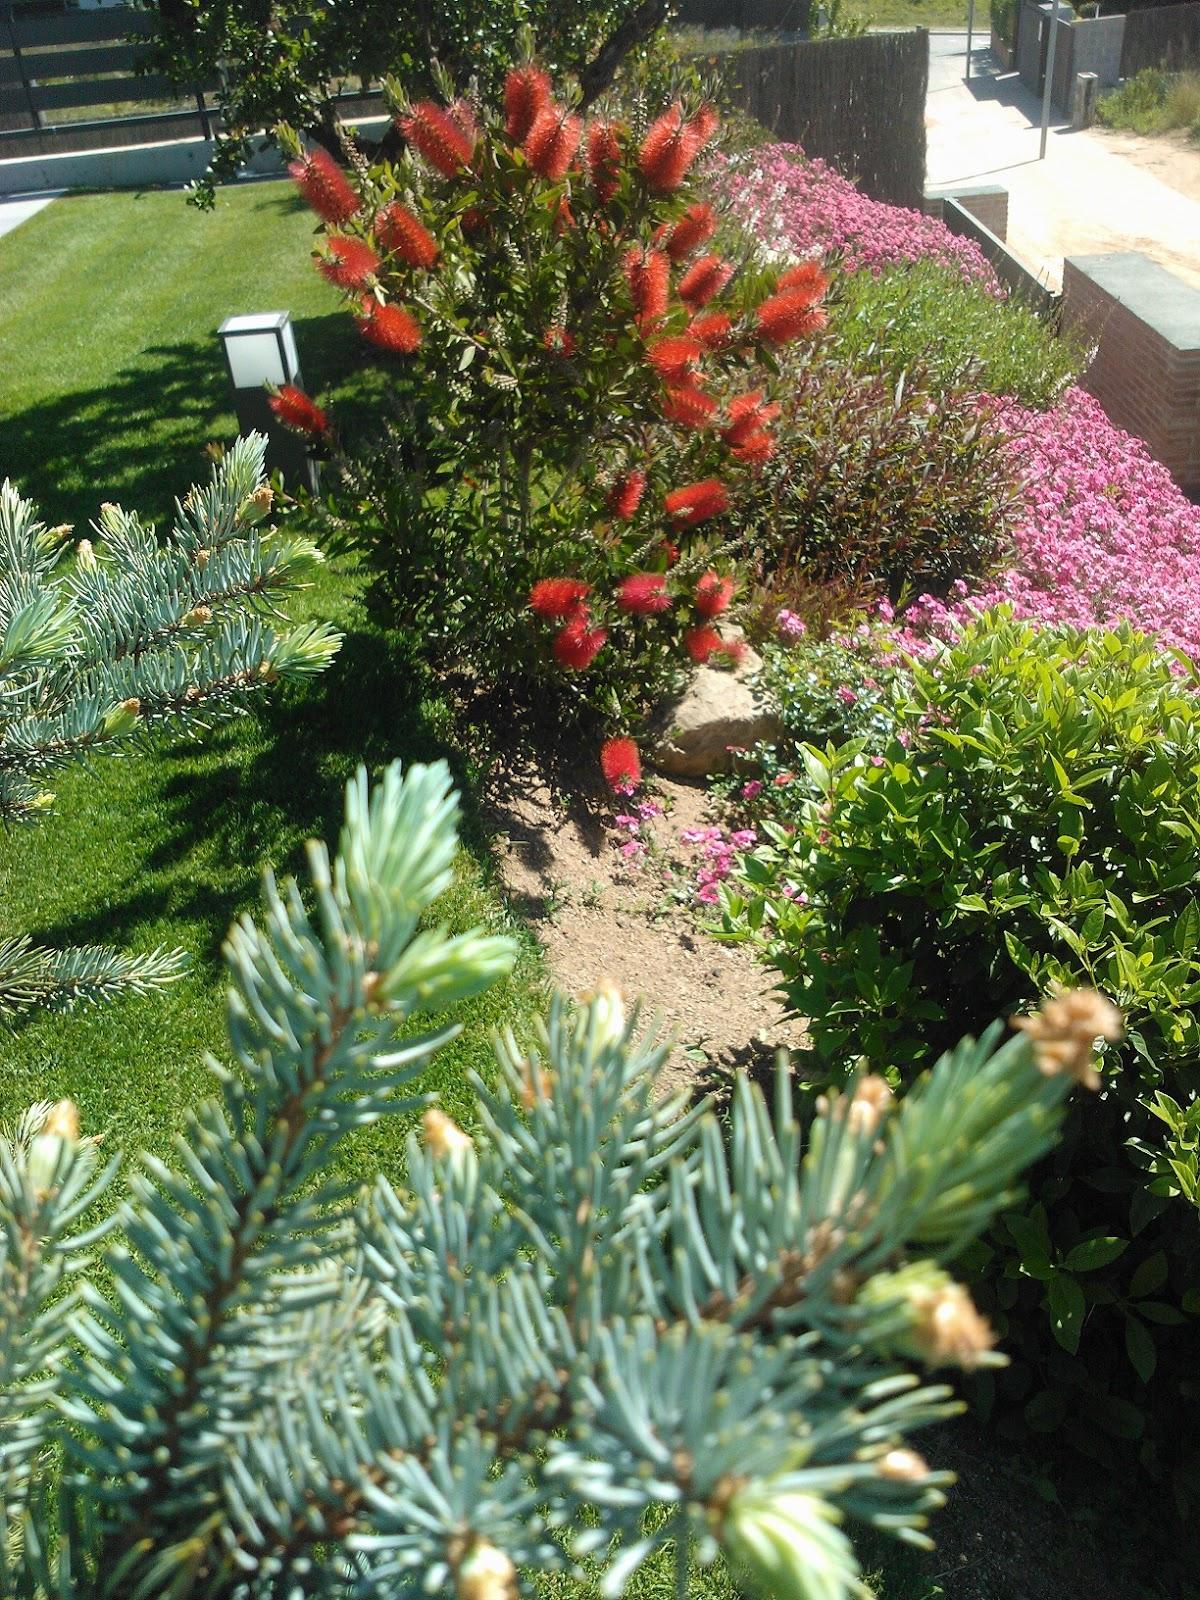 Blog medijard mantenimiento de jardines for Mantenimiento de jardines